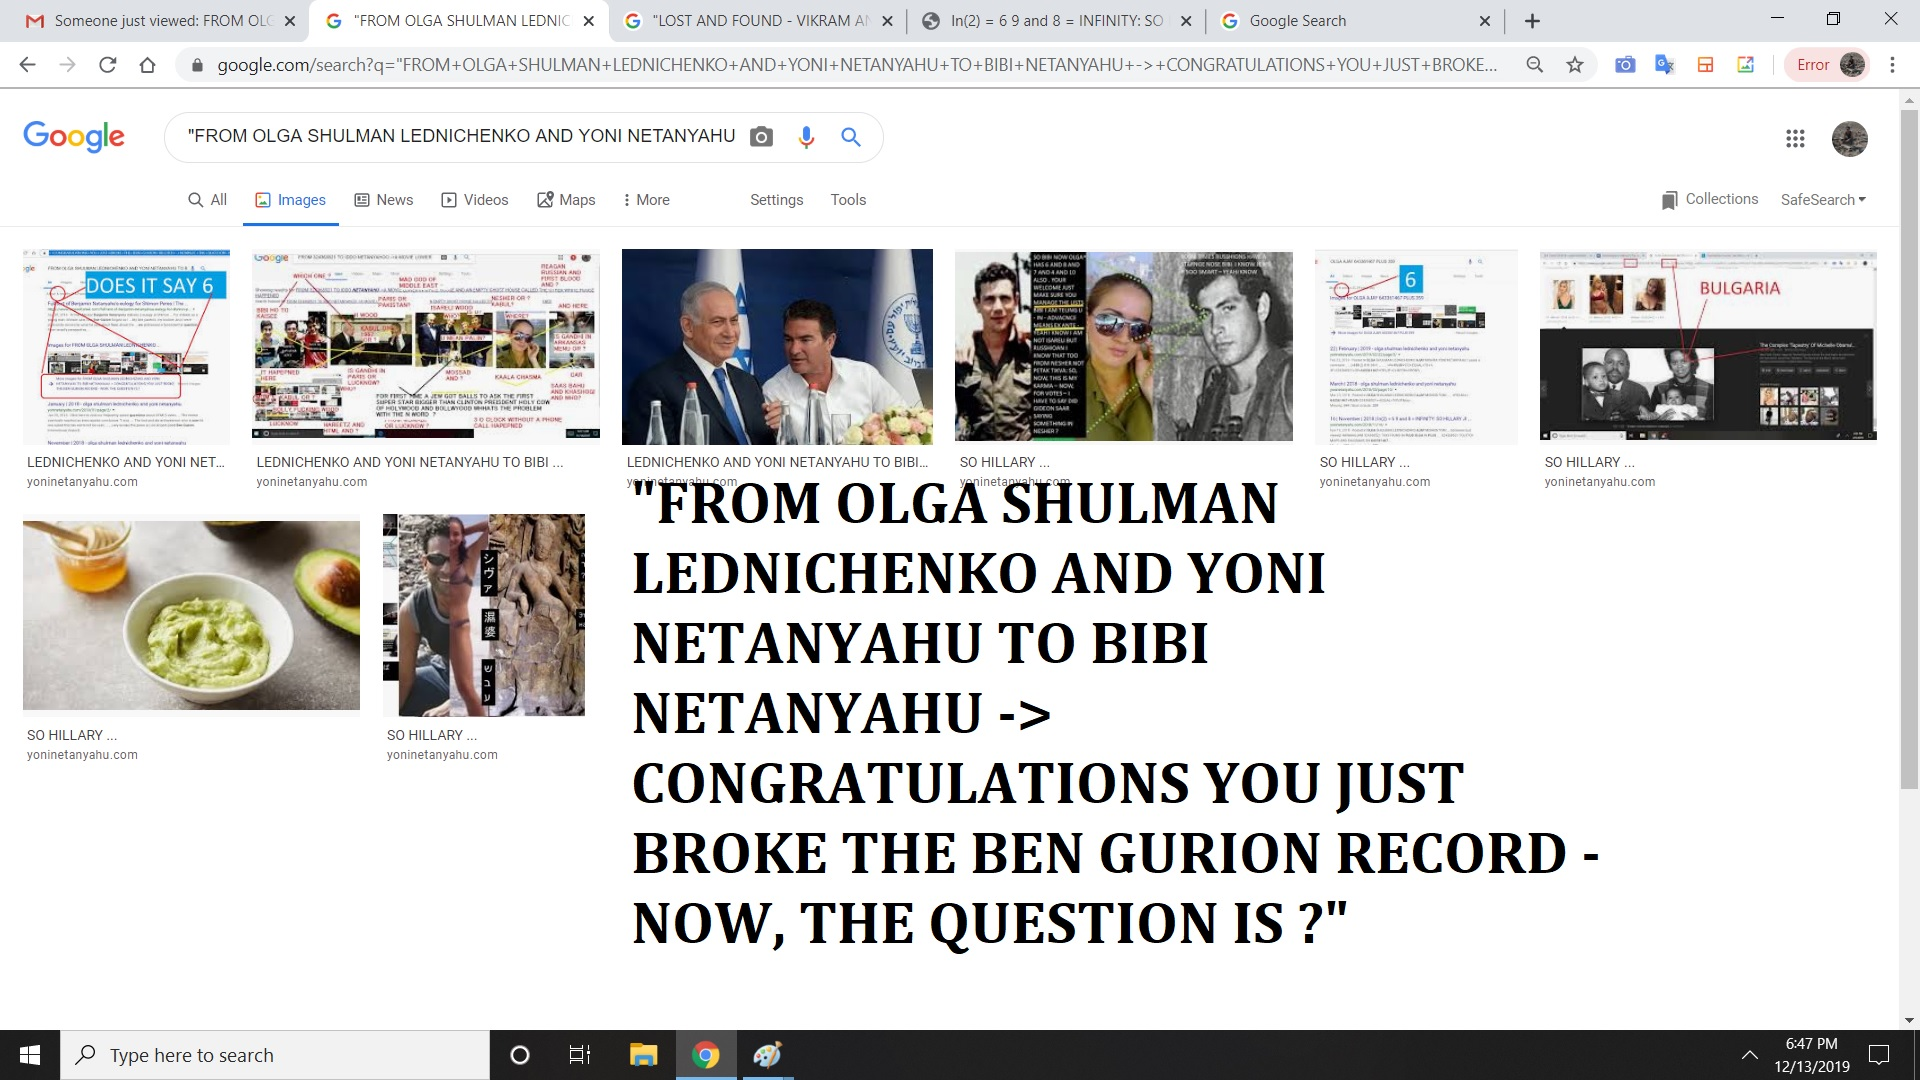 FROM OLGA SHULMAN LEDNICHENKO AND YONI NETANYAHU TO BIBI NETANYAHU CONGRATULATIONS YOU JUST BROKE THE BEN GURION RECORD - NOW, THE QUESTION IS